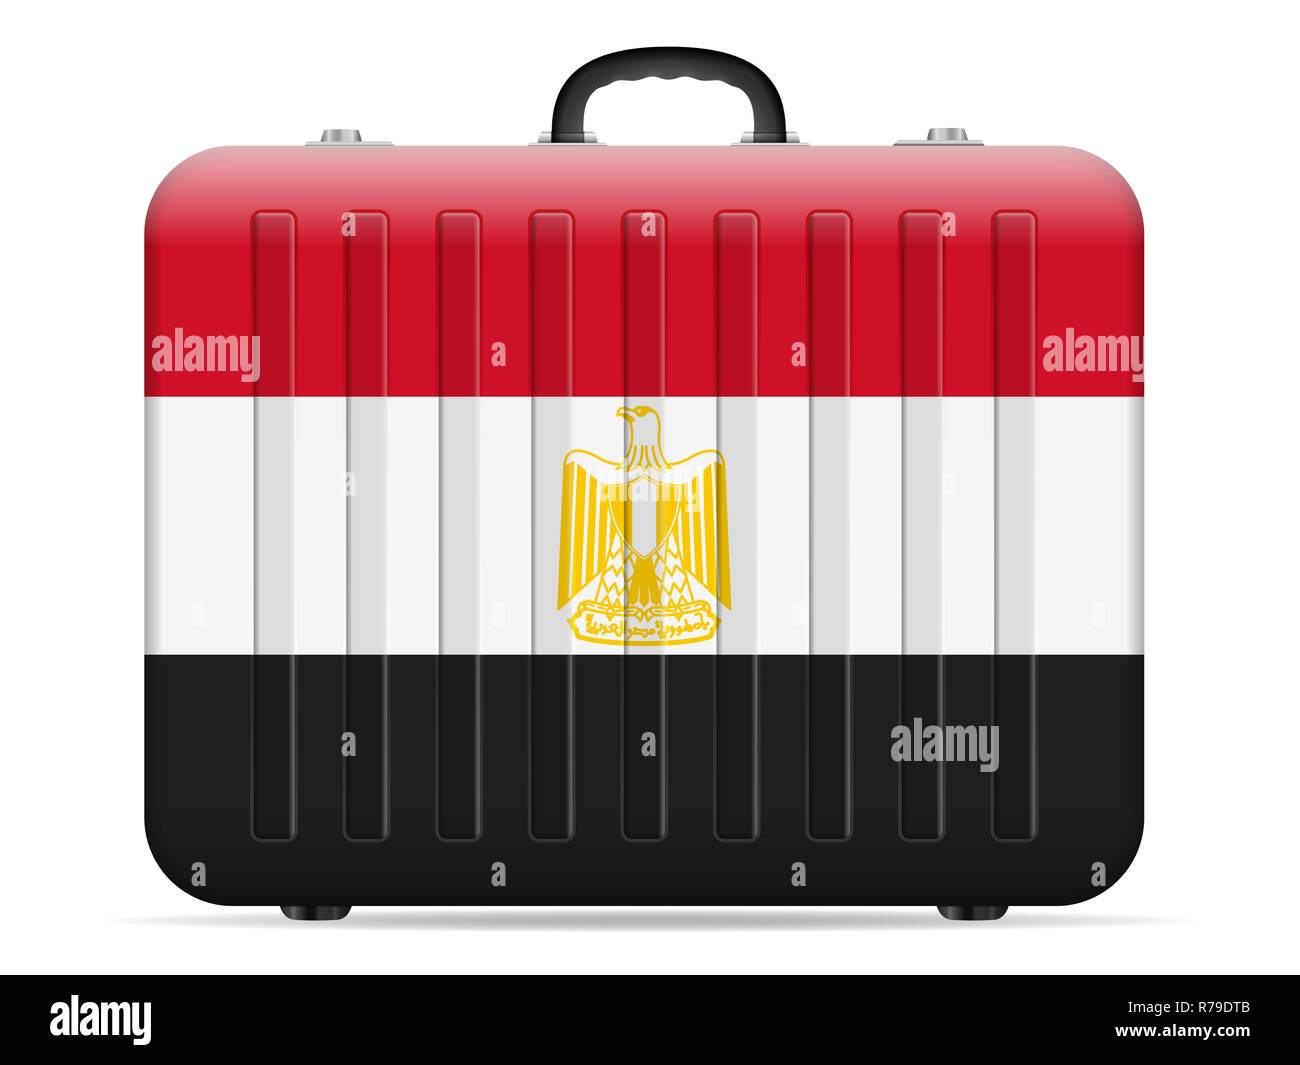 e031c36d9 Egipto bandera maleta de viaje sobre un fondo blanco. Ilustración vectorial.  Imagen De Stock